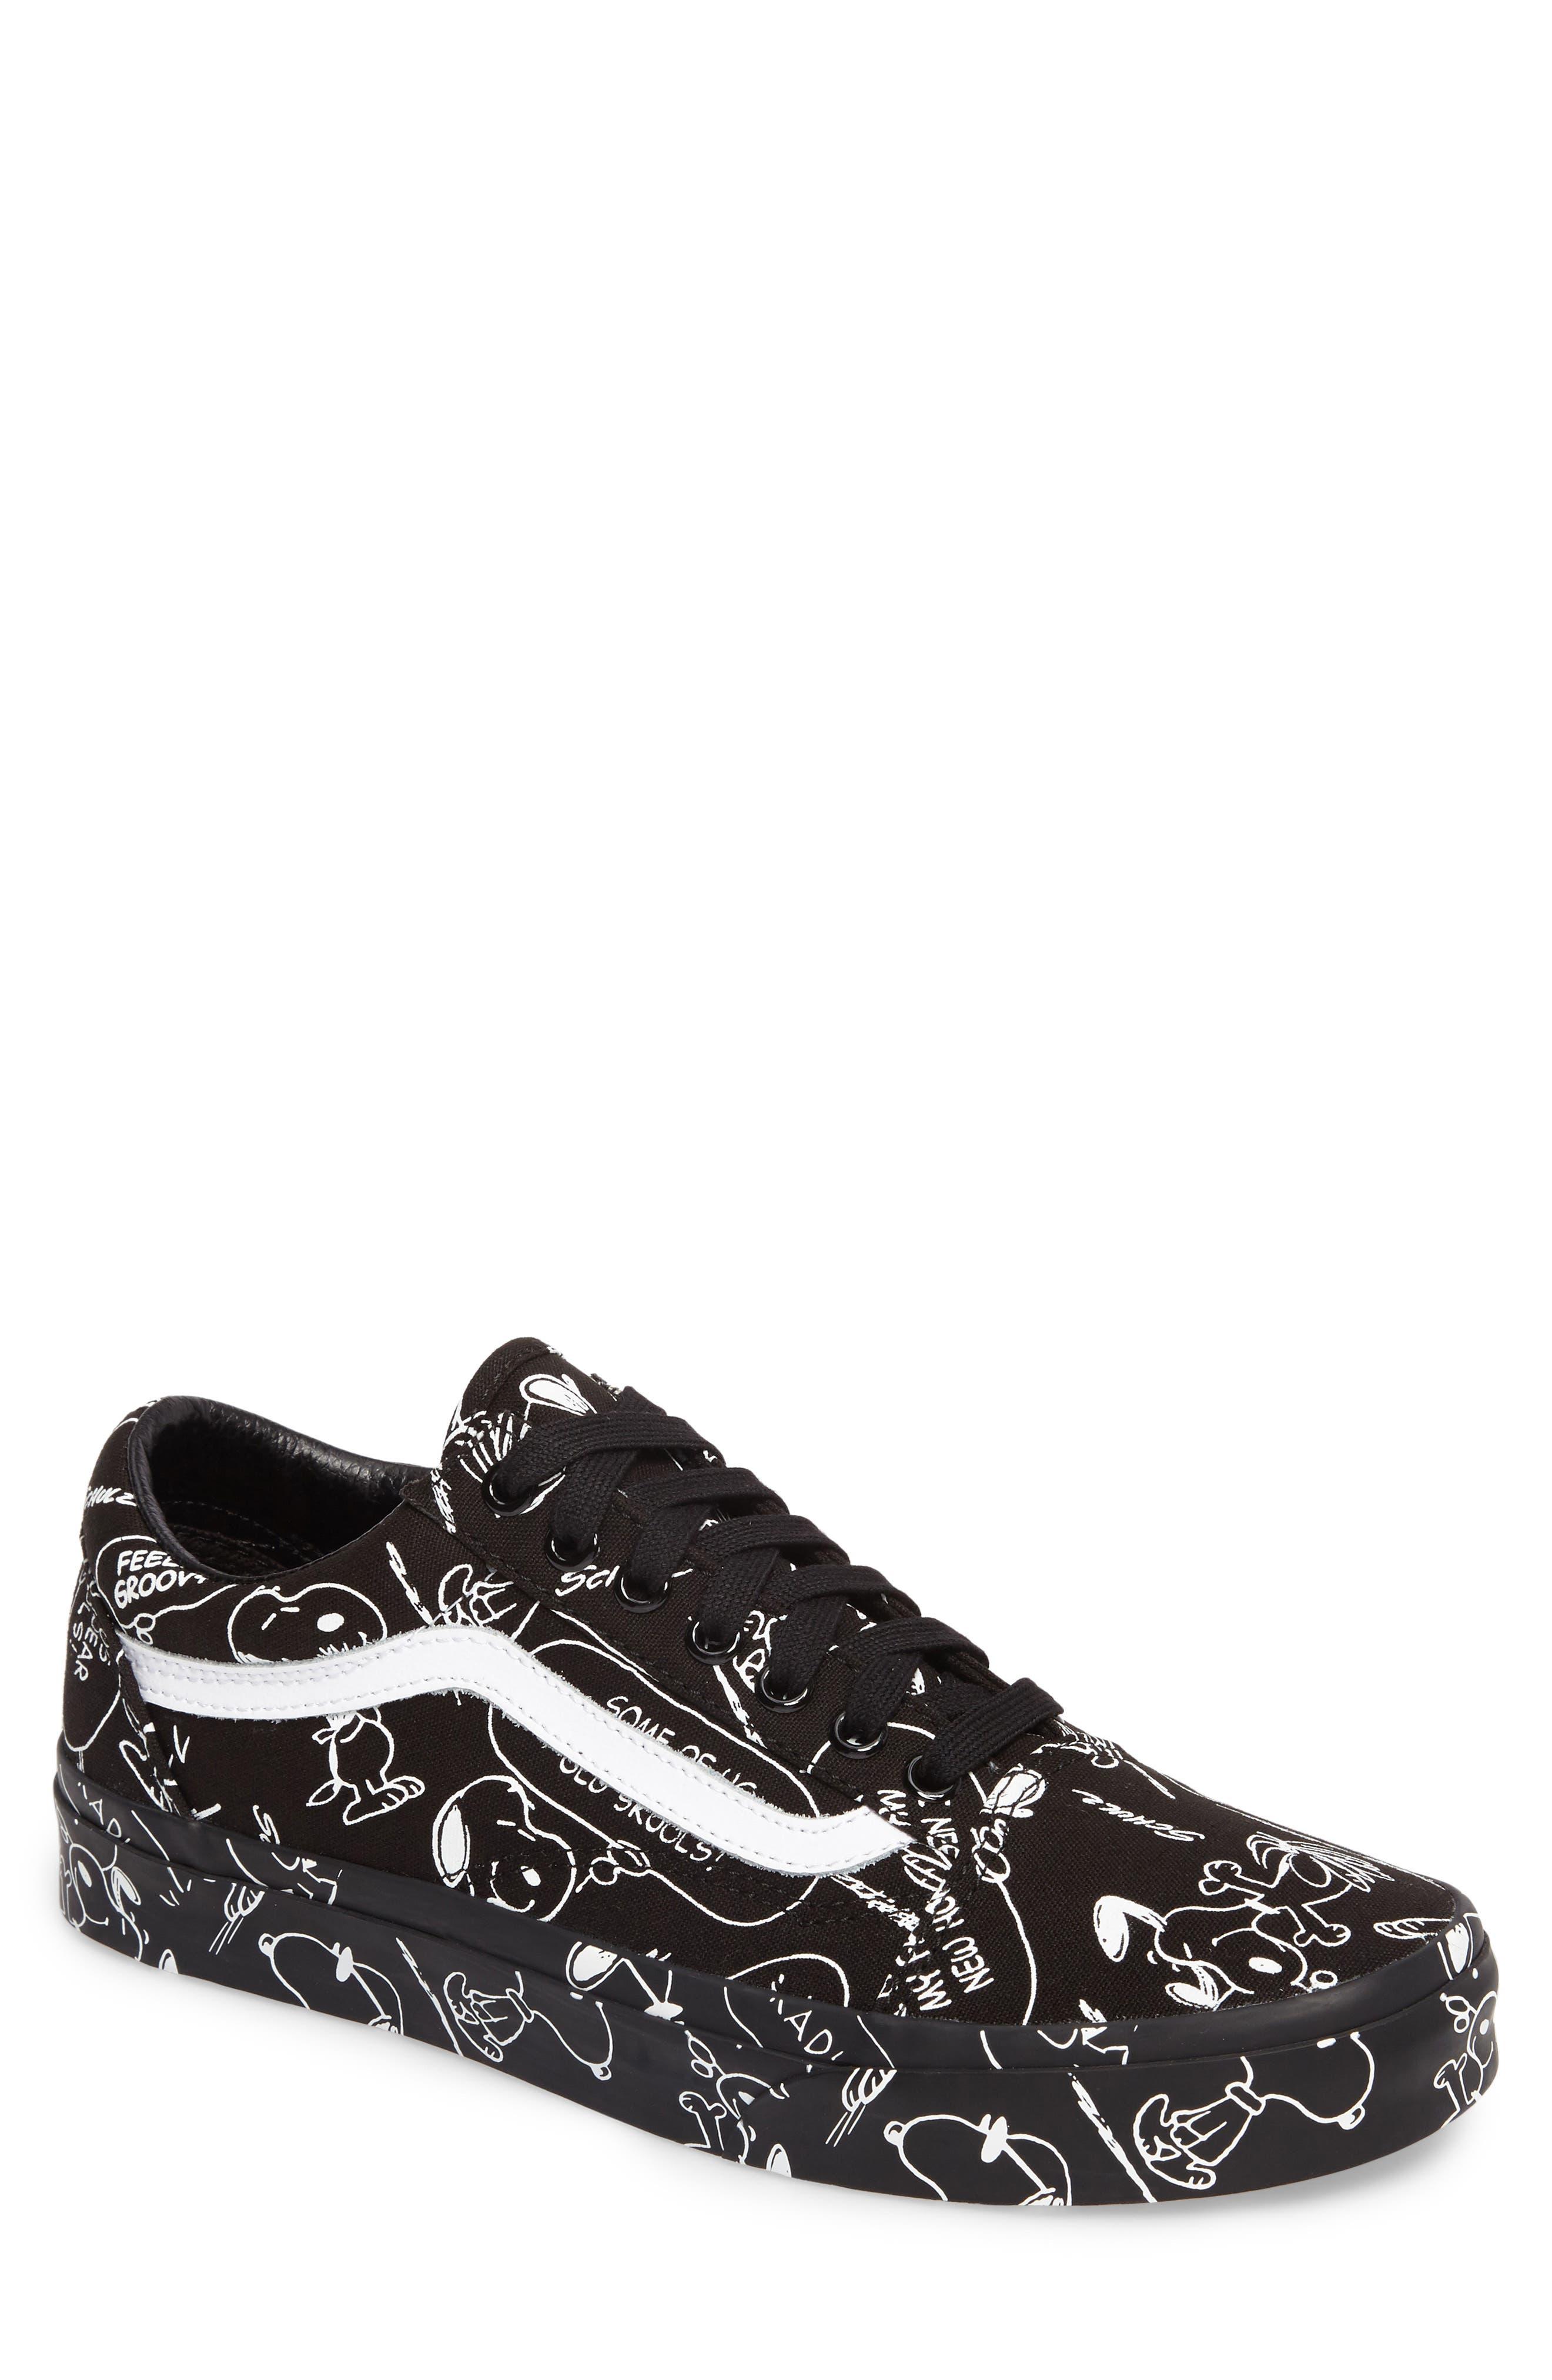 x Peanuts<sup>®</sup> Old Skool Sneaker,                         Main,                         color, 001